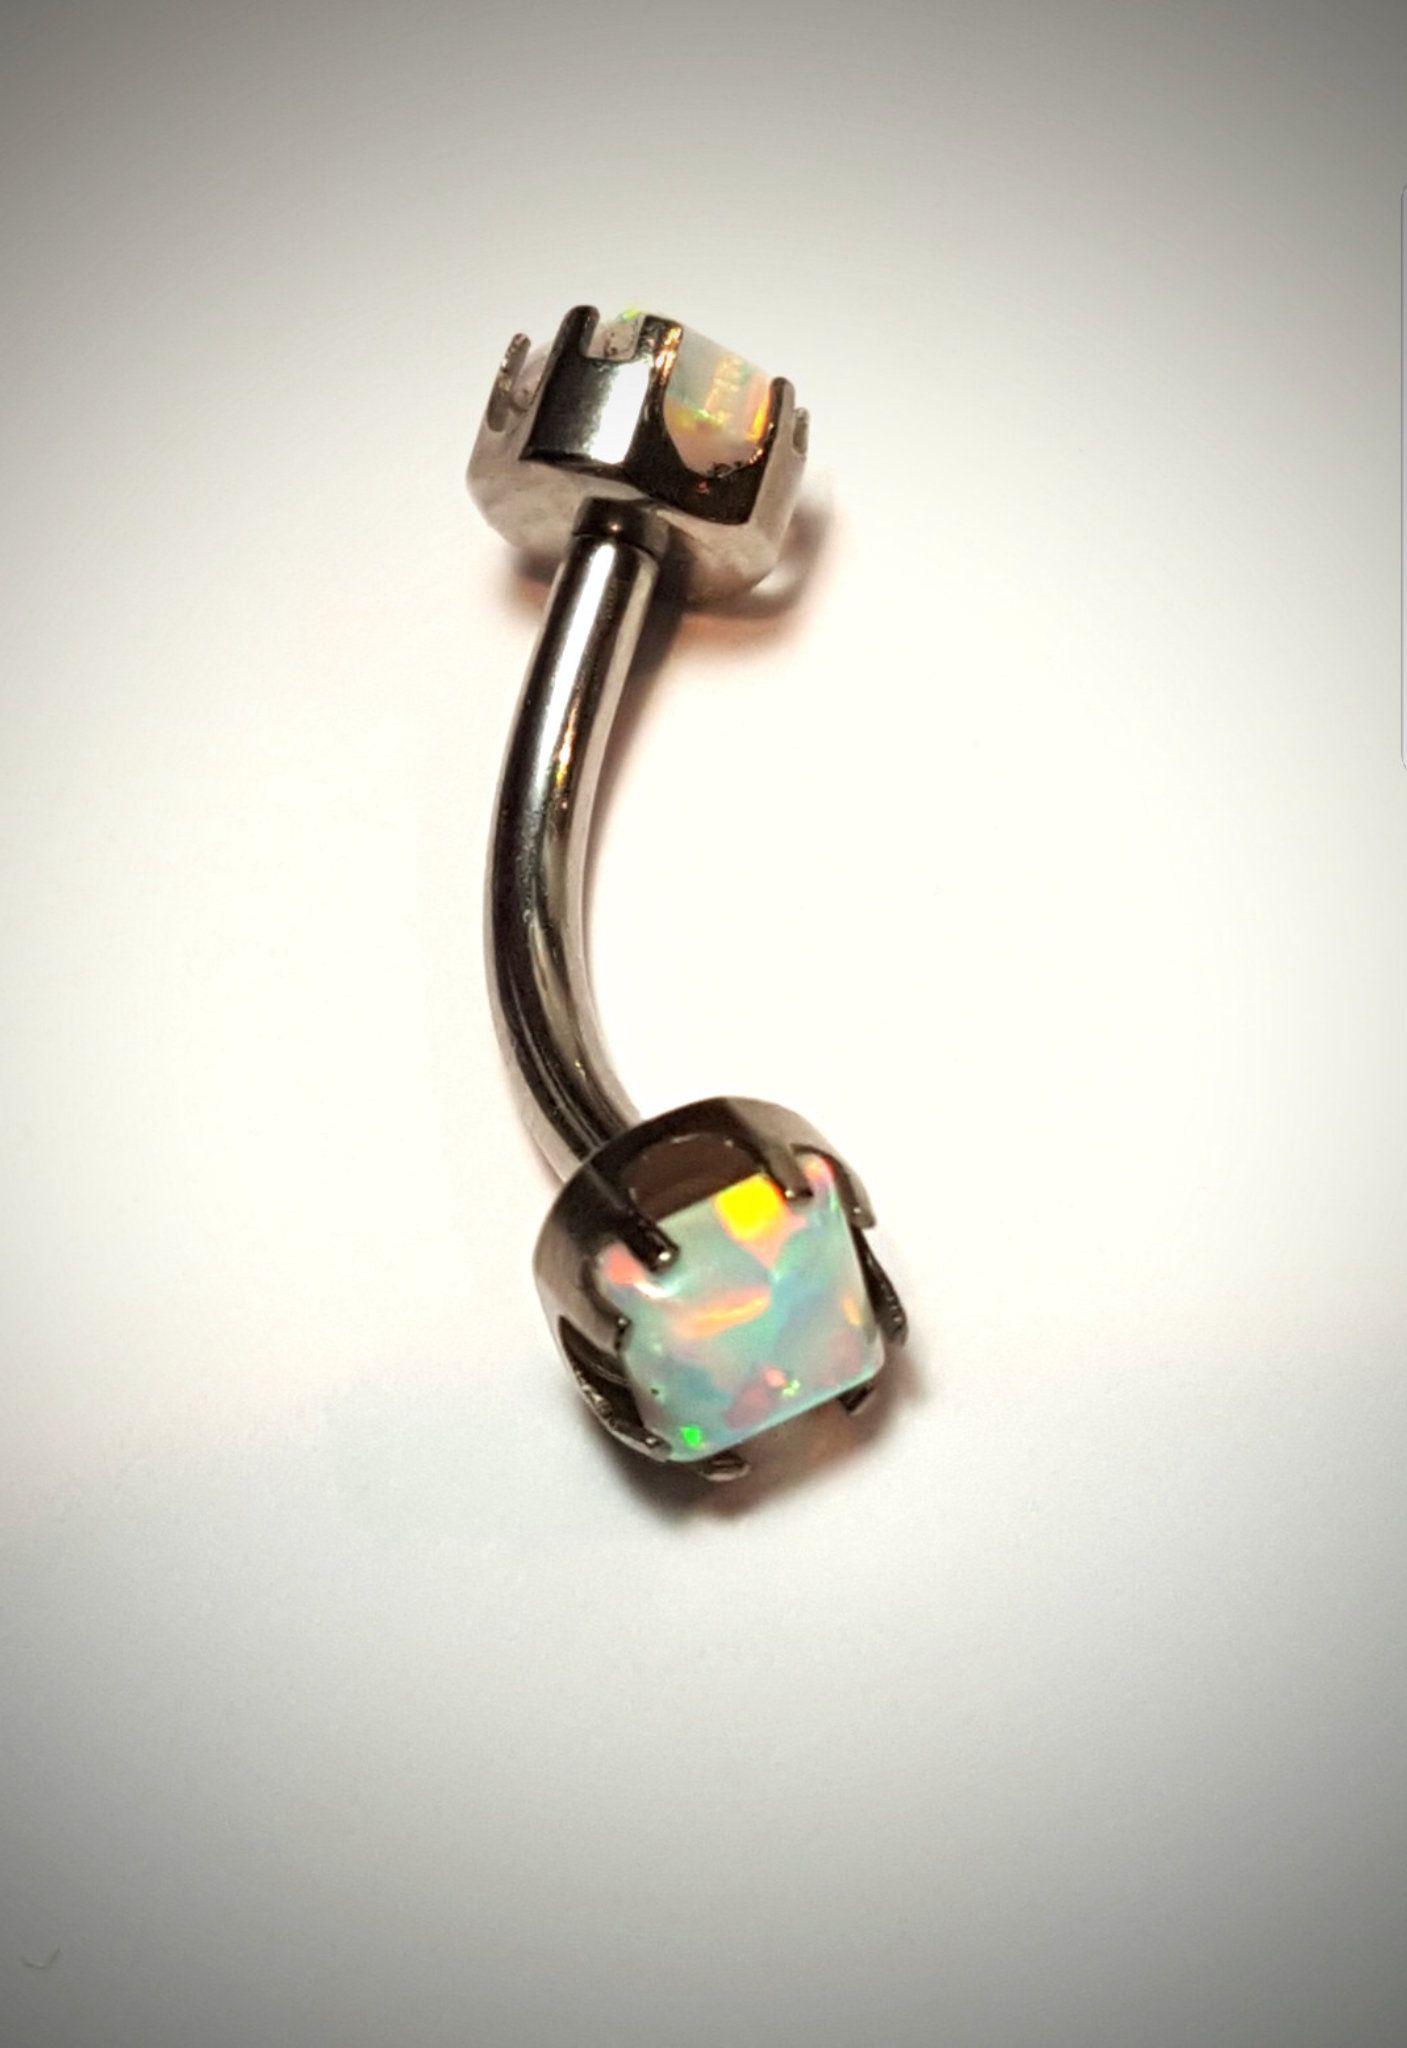 Internal Threading Prong Top Opal Vch Navel Belly Button Christina